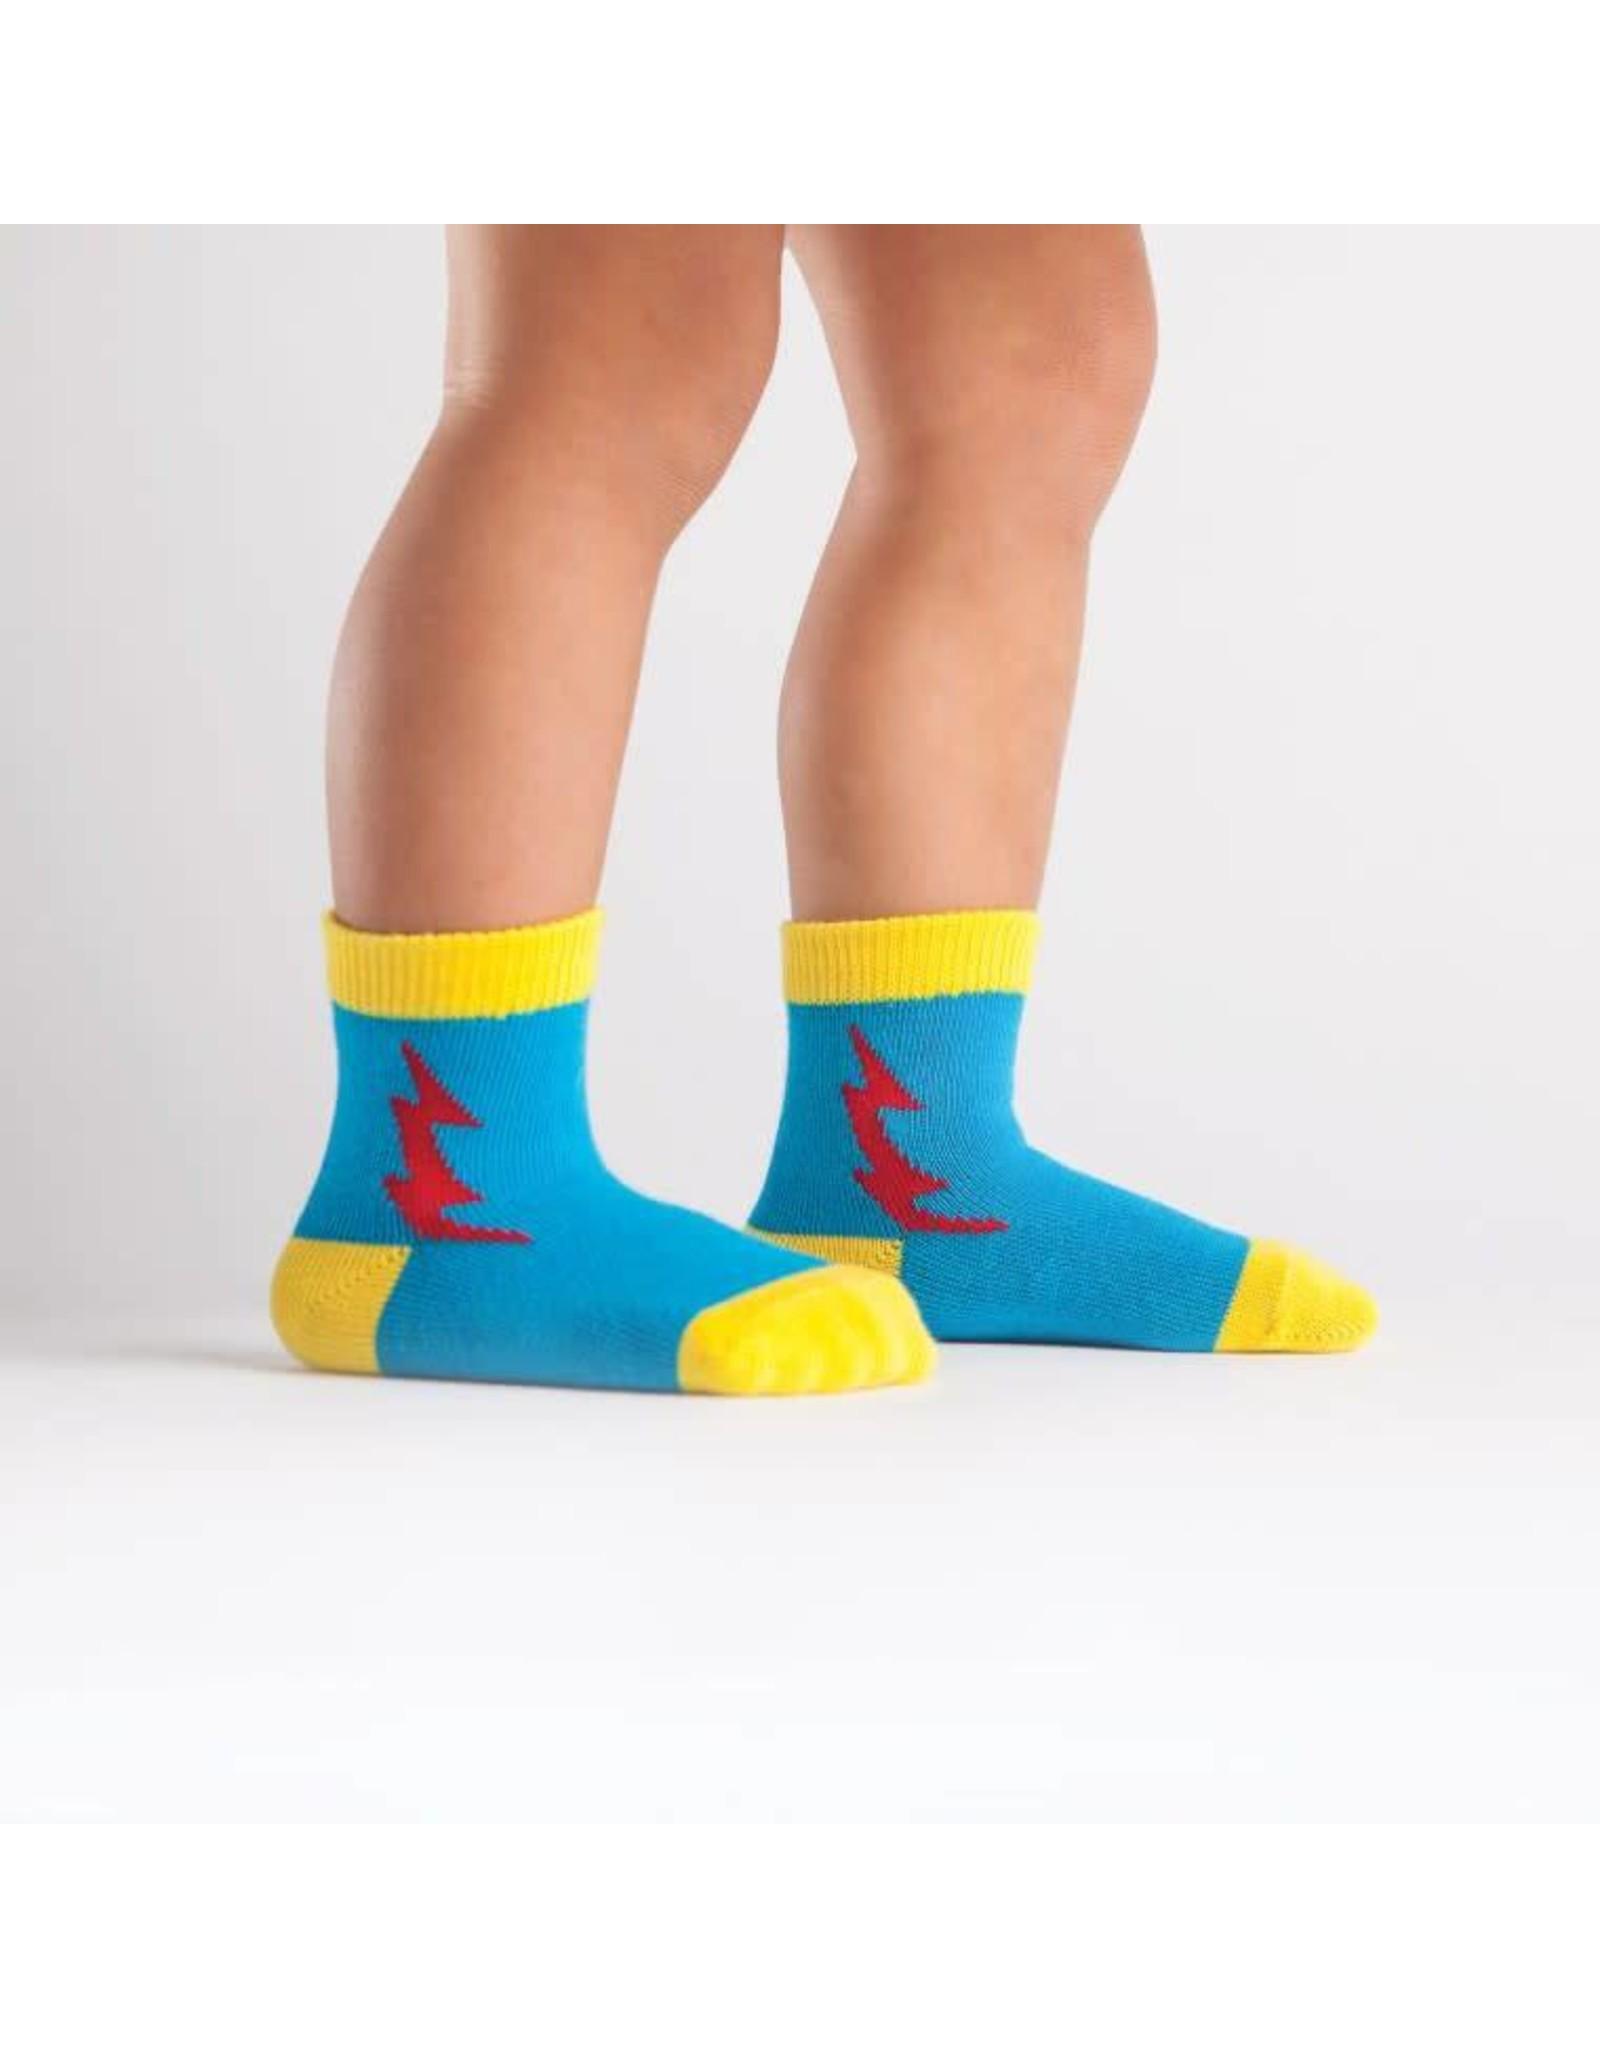 SOCK IT TO ME - Toddler Super Hero! Blue/Red Socks